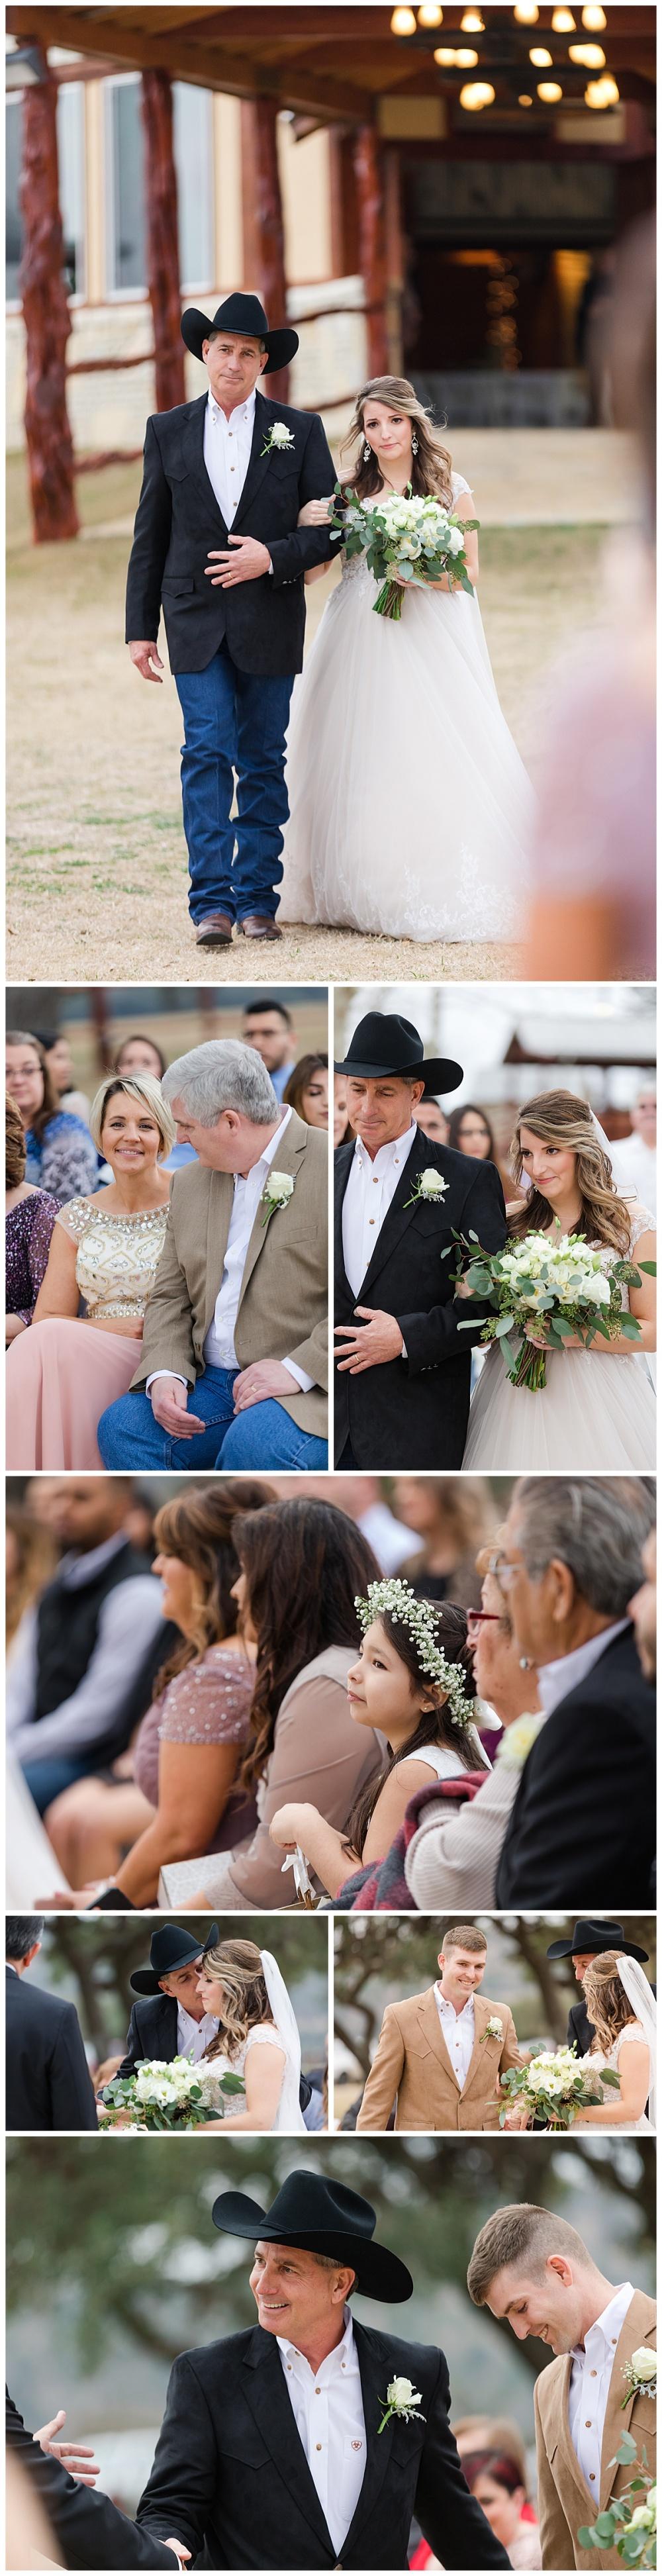 Wedding-Photographer-Texas-Hill-Country-Happy-H-Ranch-Comfor-Texas-Carly-Barton-Photography_0031.jpg